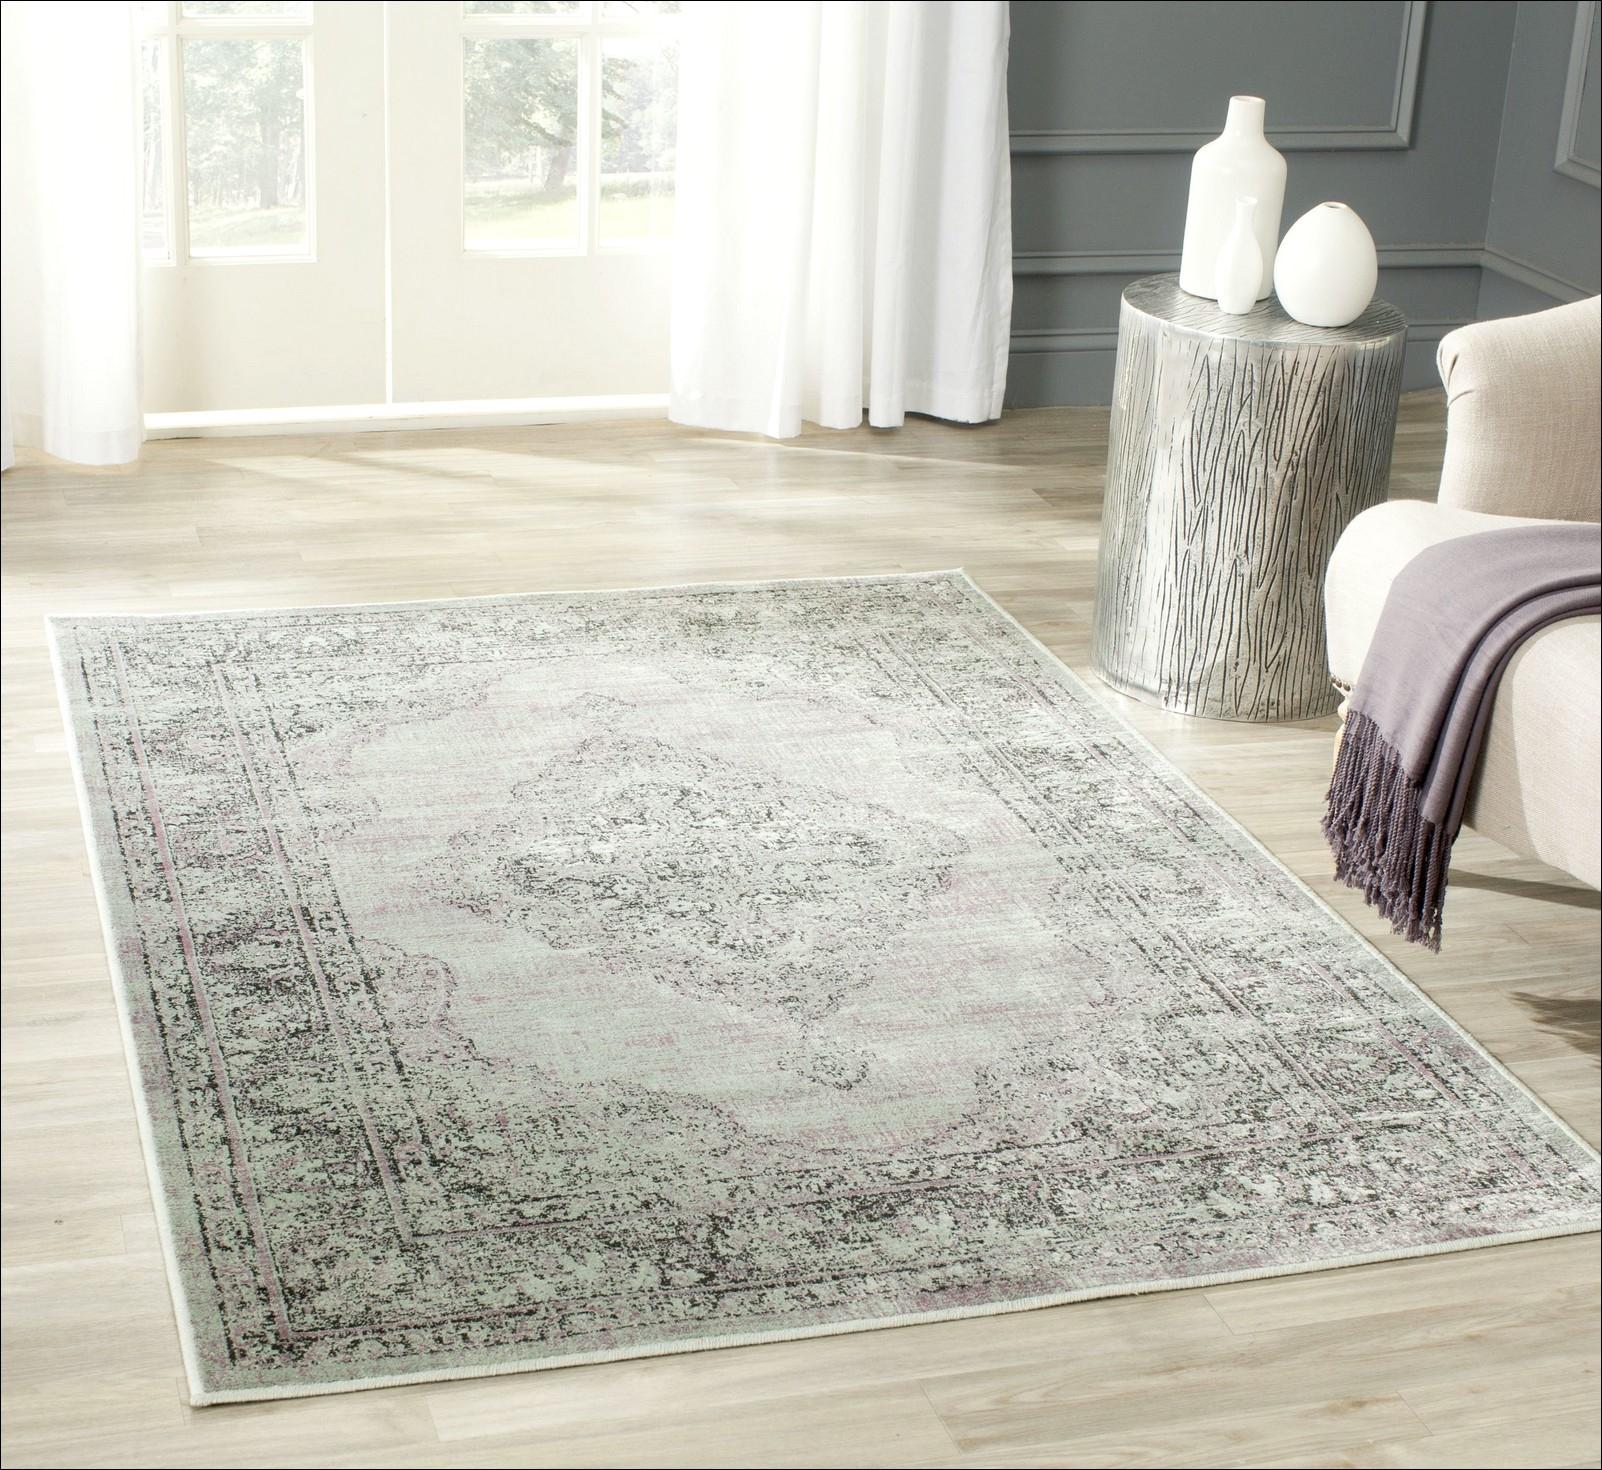 15 inspirations of wool area rugs toronto